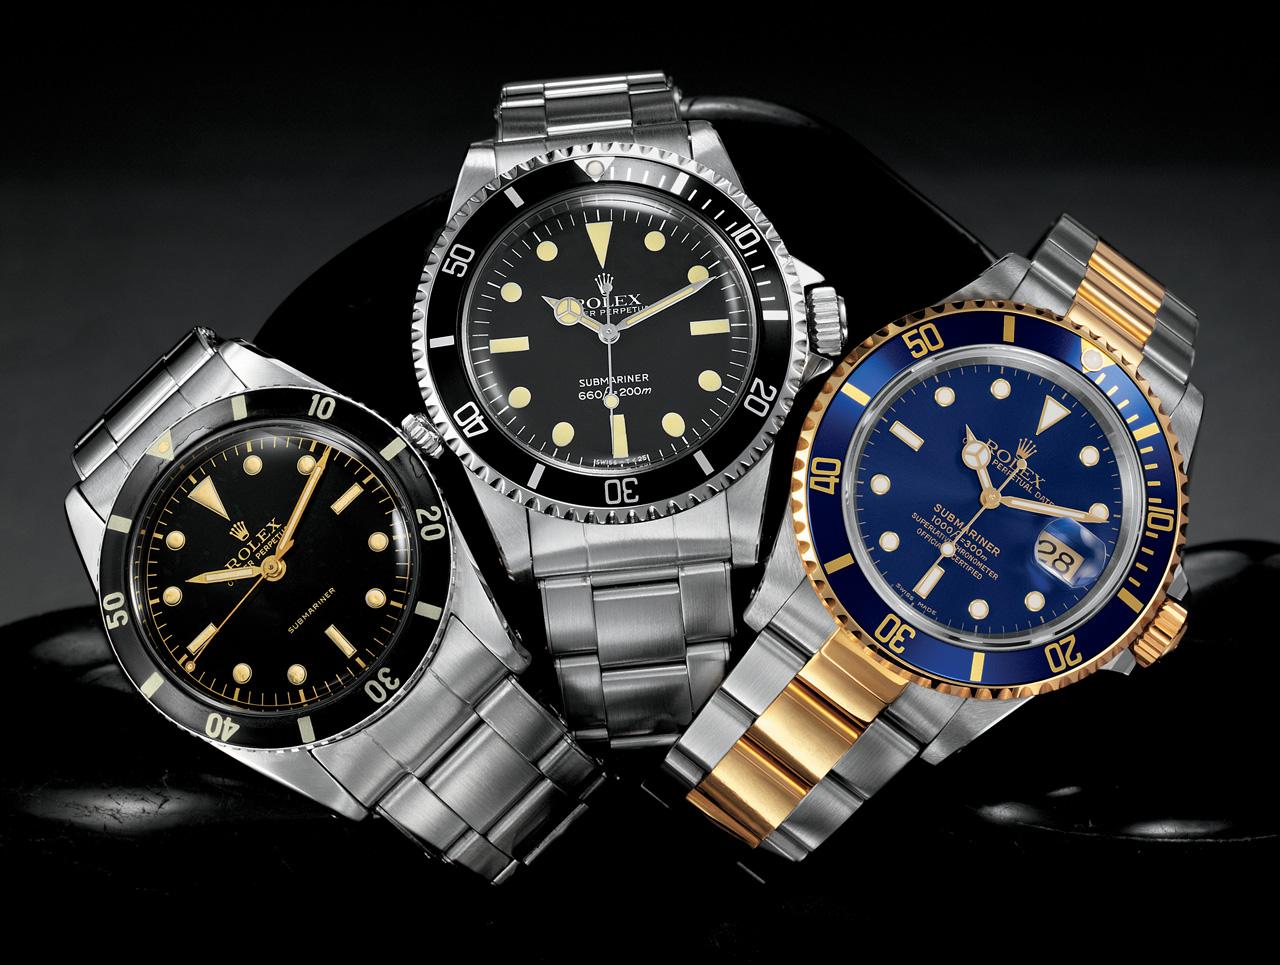 Đồng hồ Rolex